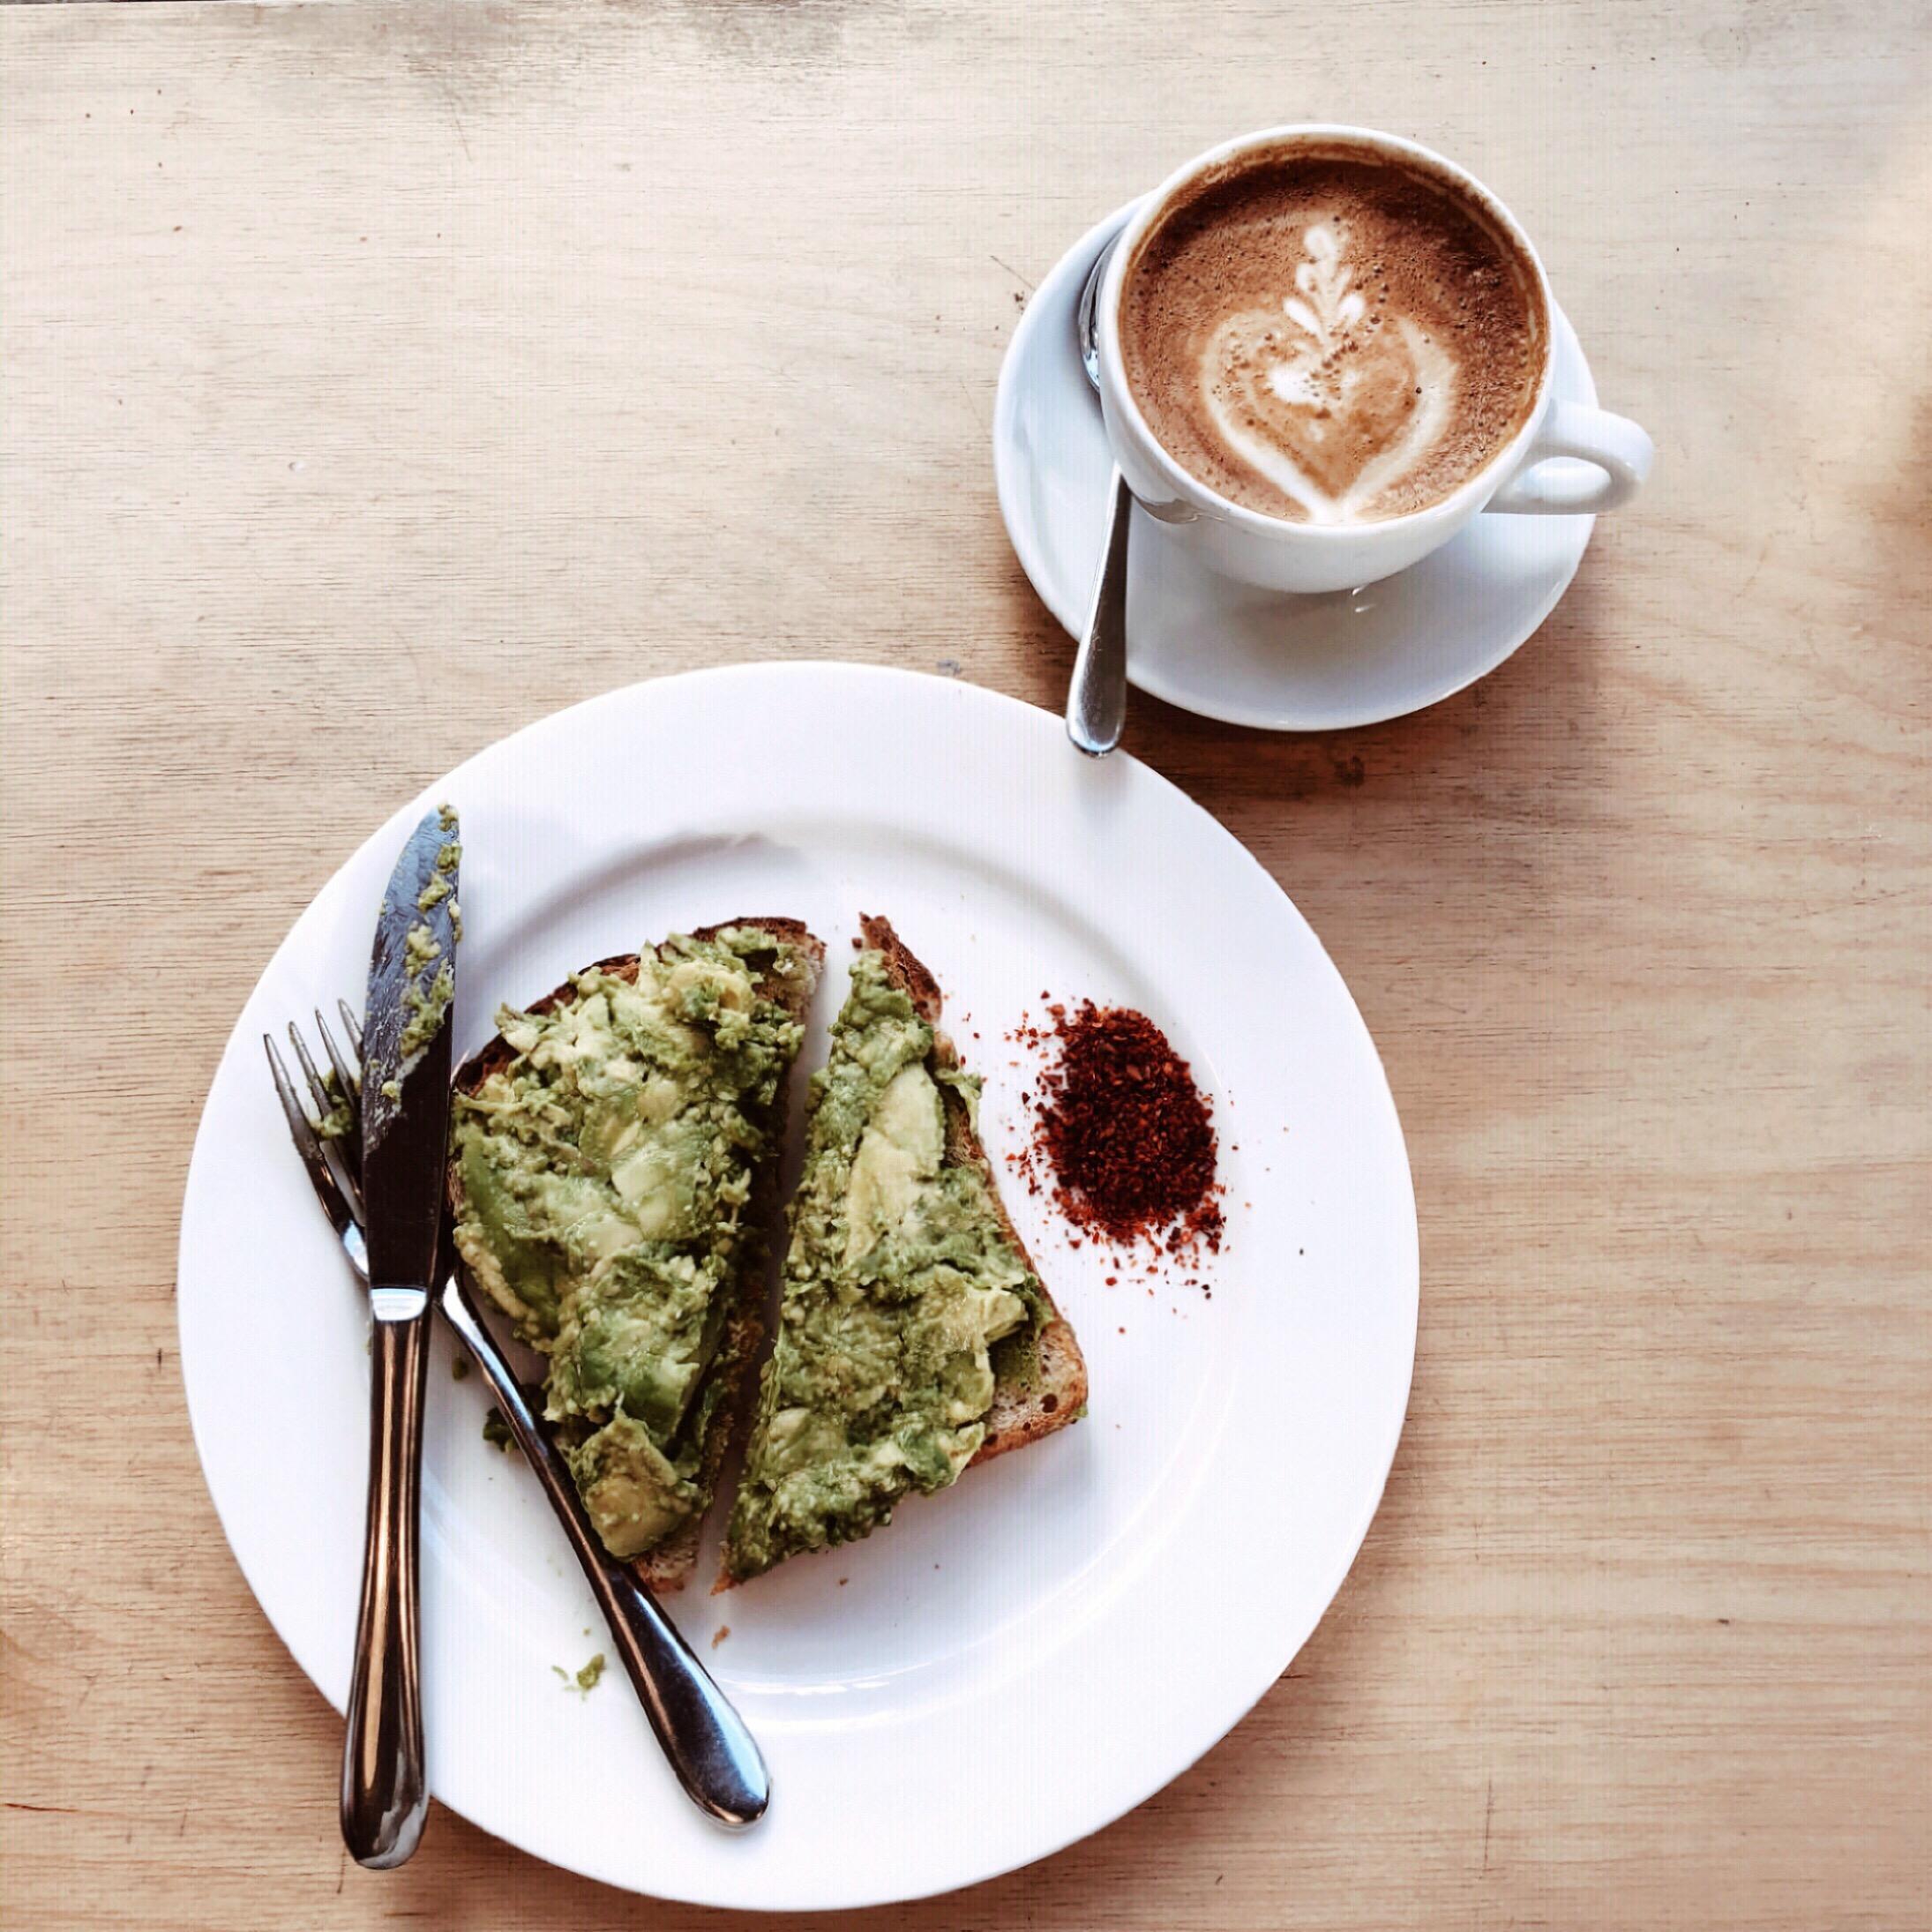 coffee and avocado